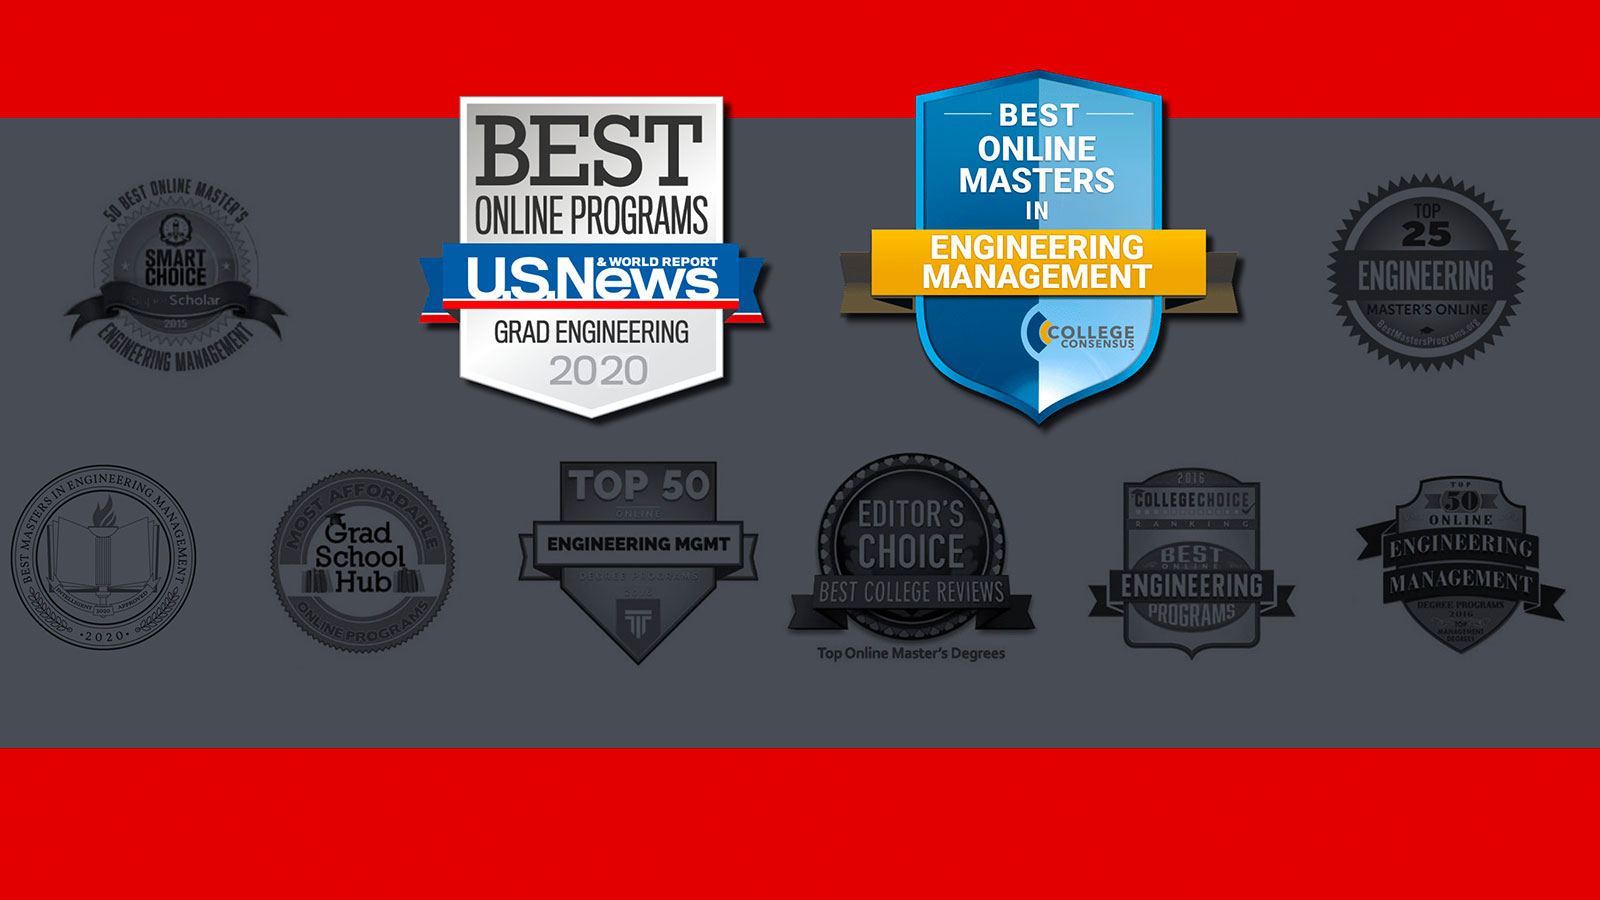 MEM Rankings and Awards